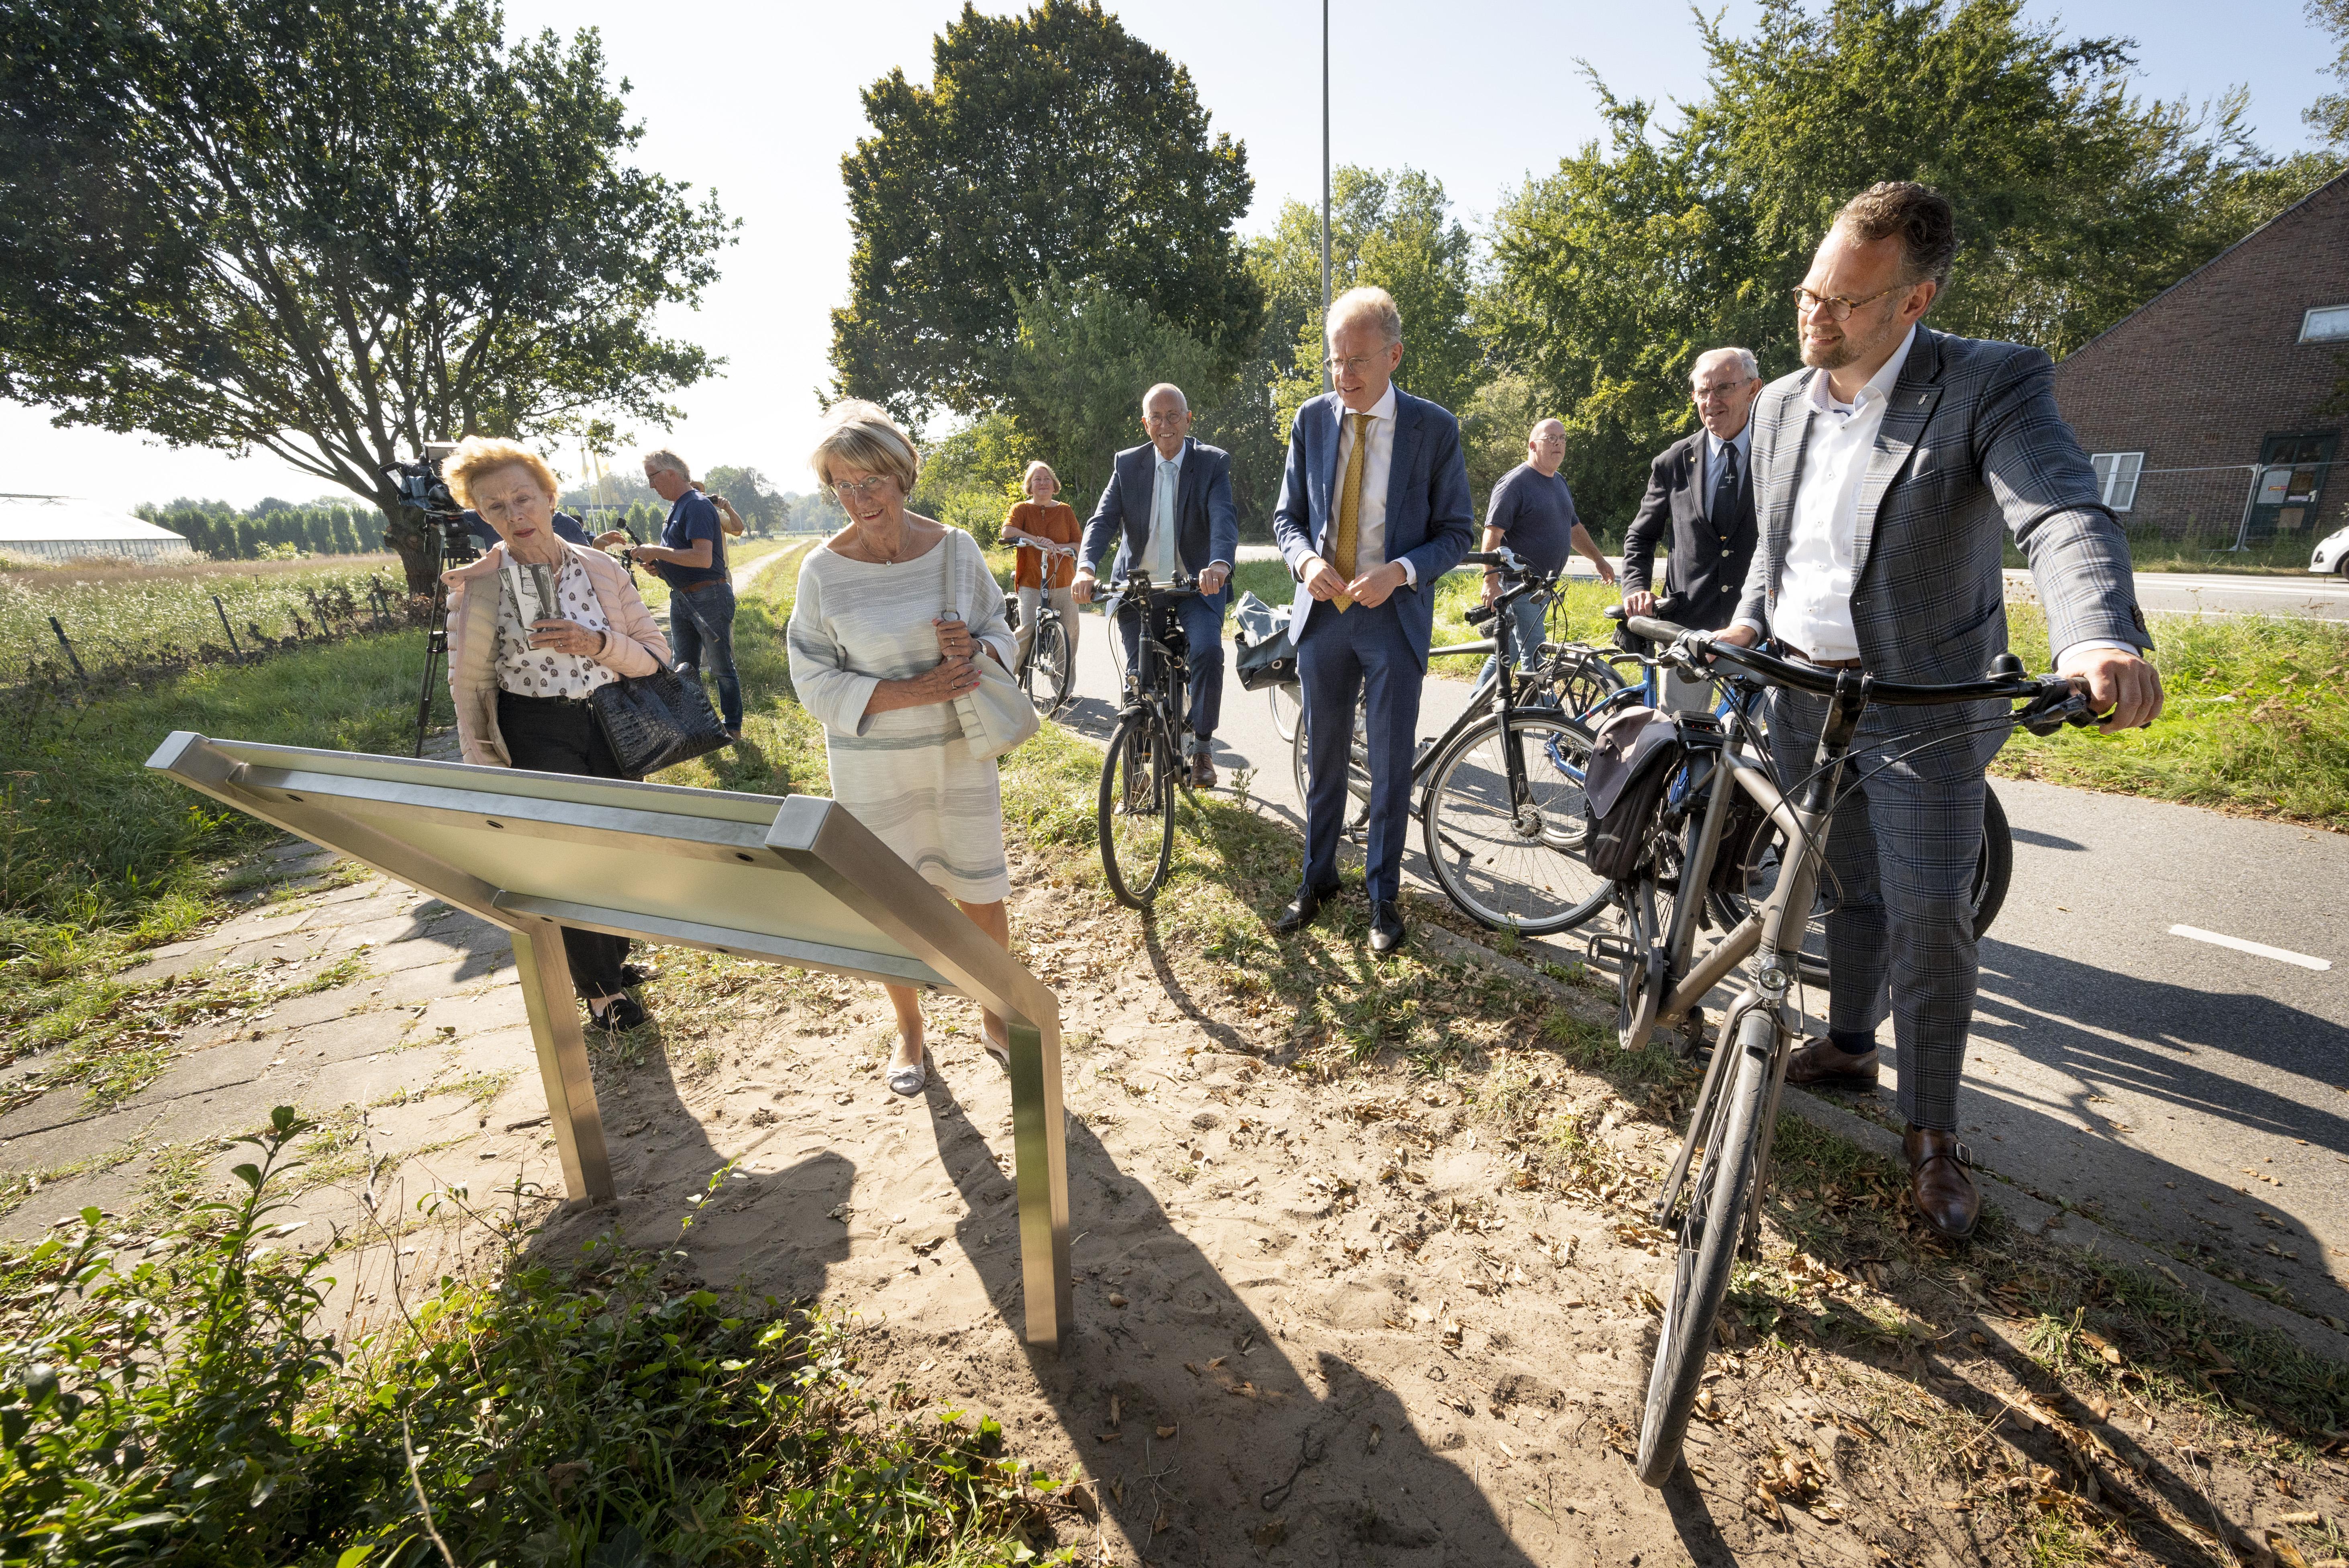 Wethouders Kees Wassenaar en Jacco Knape openen herinneringsroute vliegveld Valkenburg